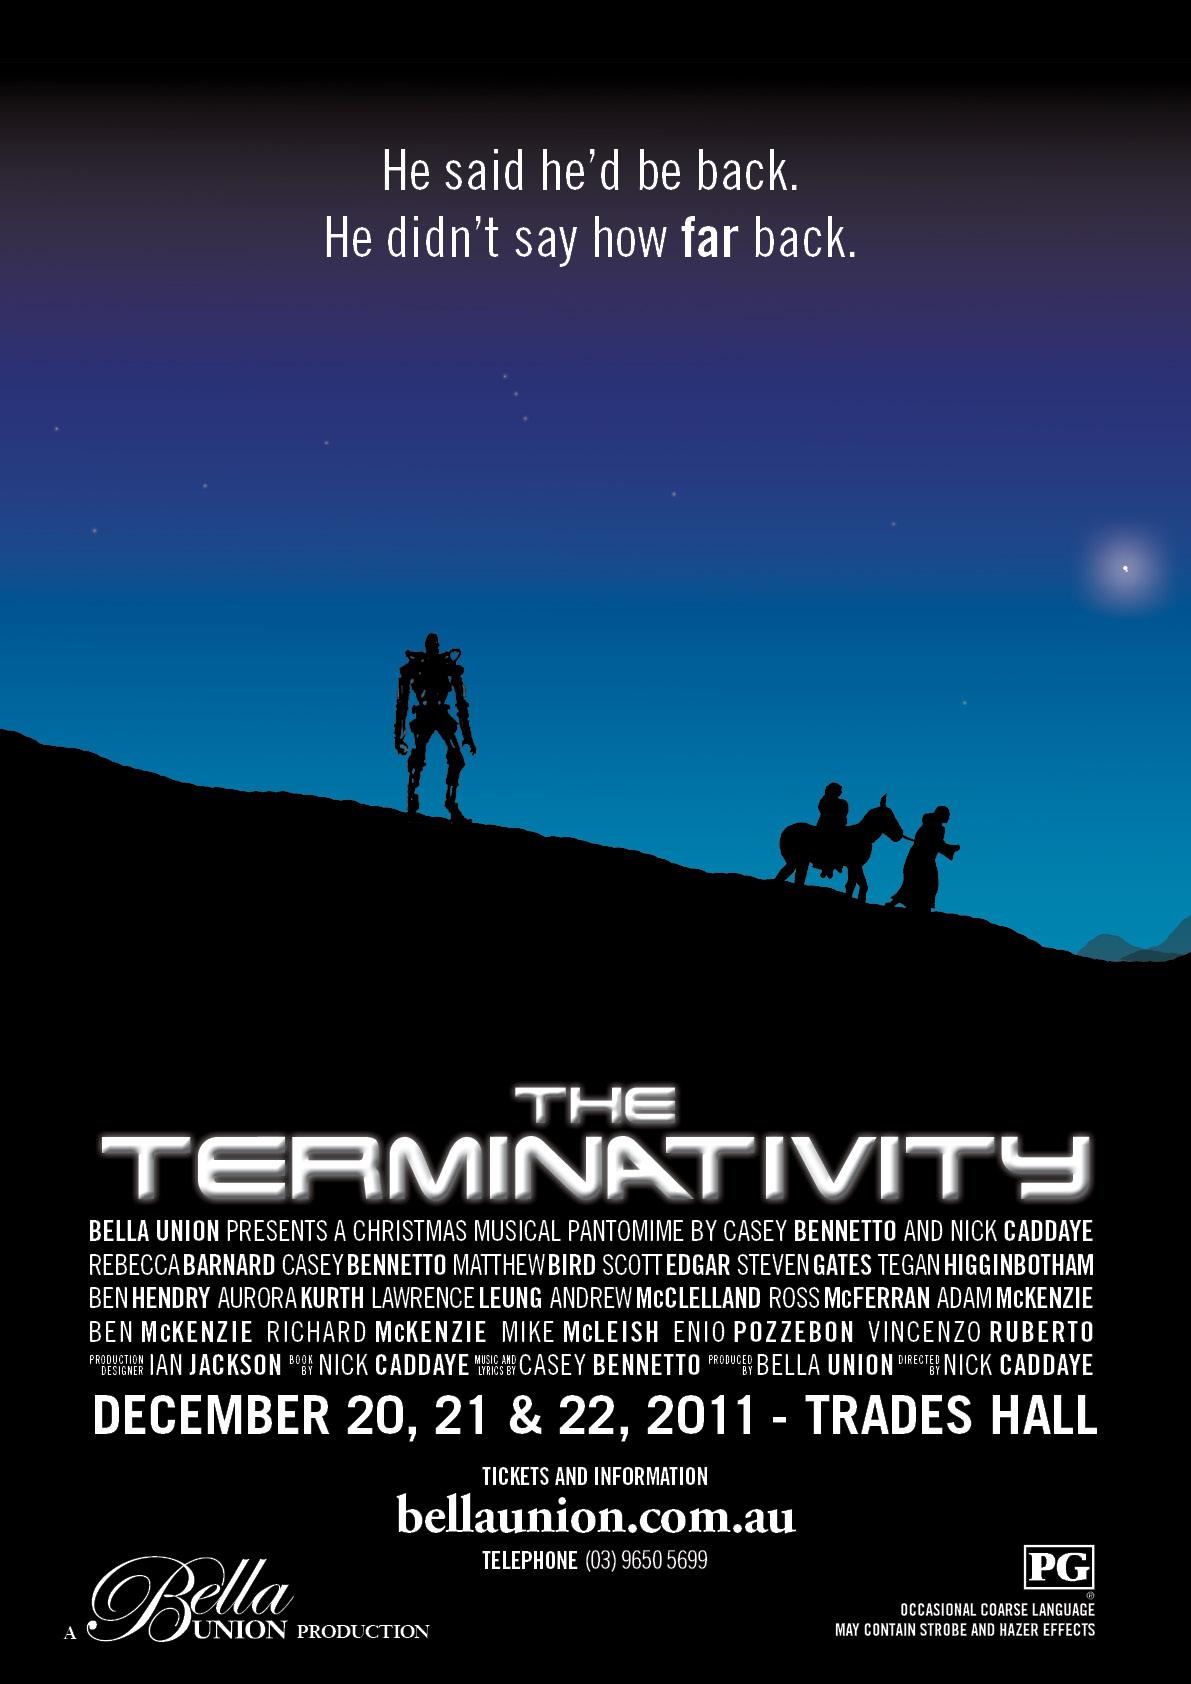 The Terminativity